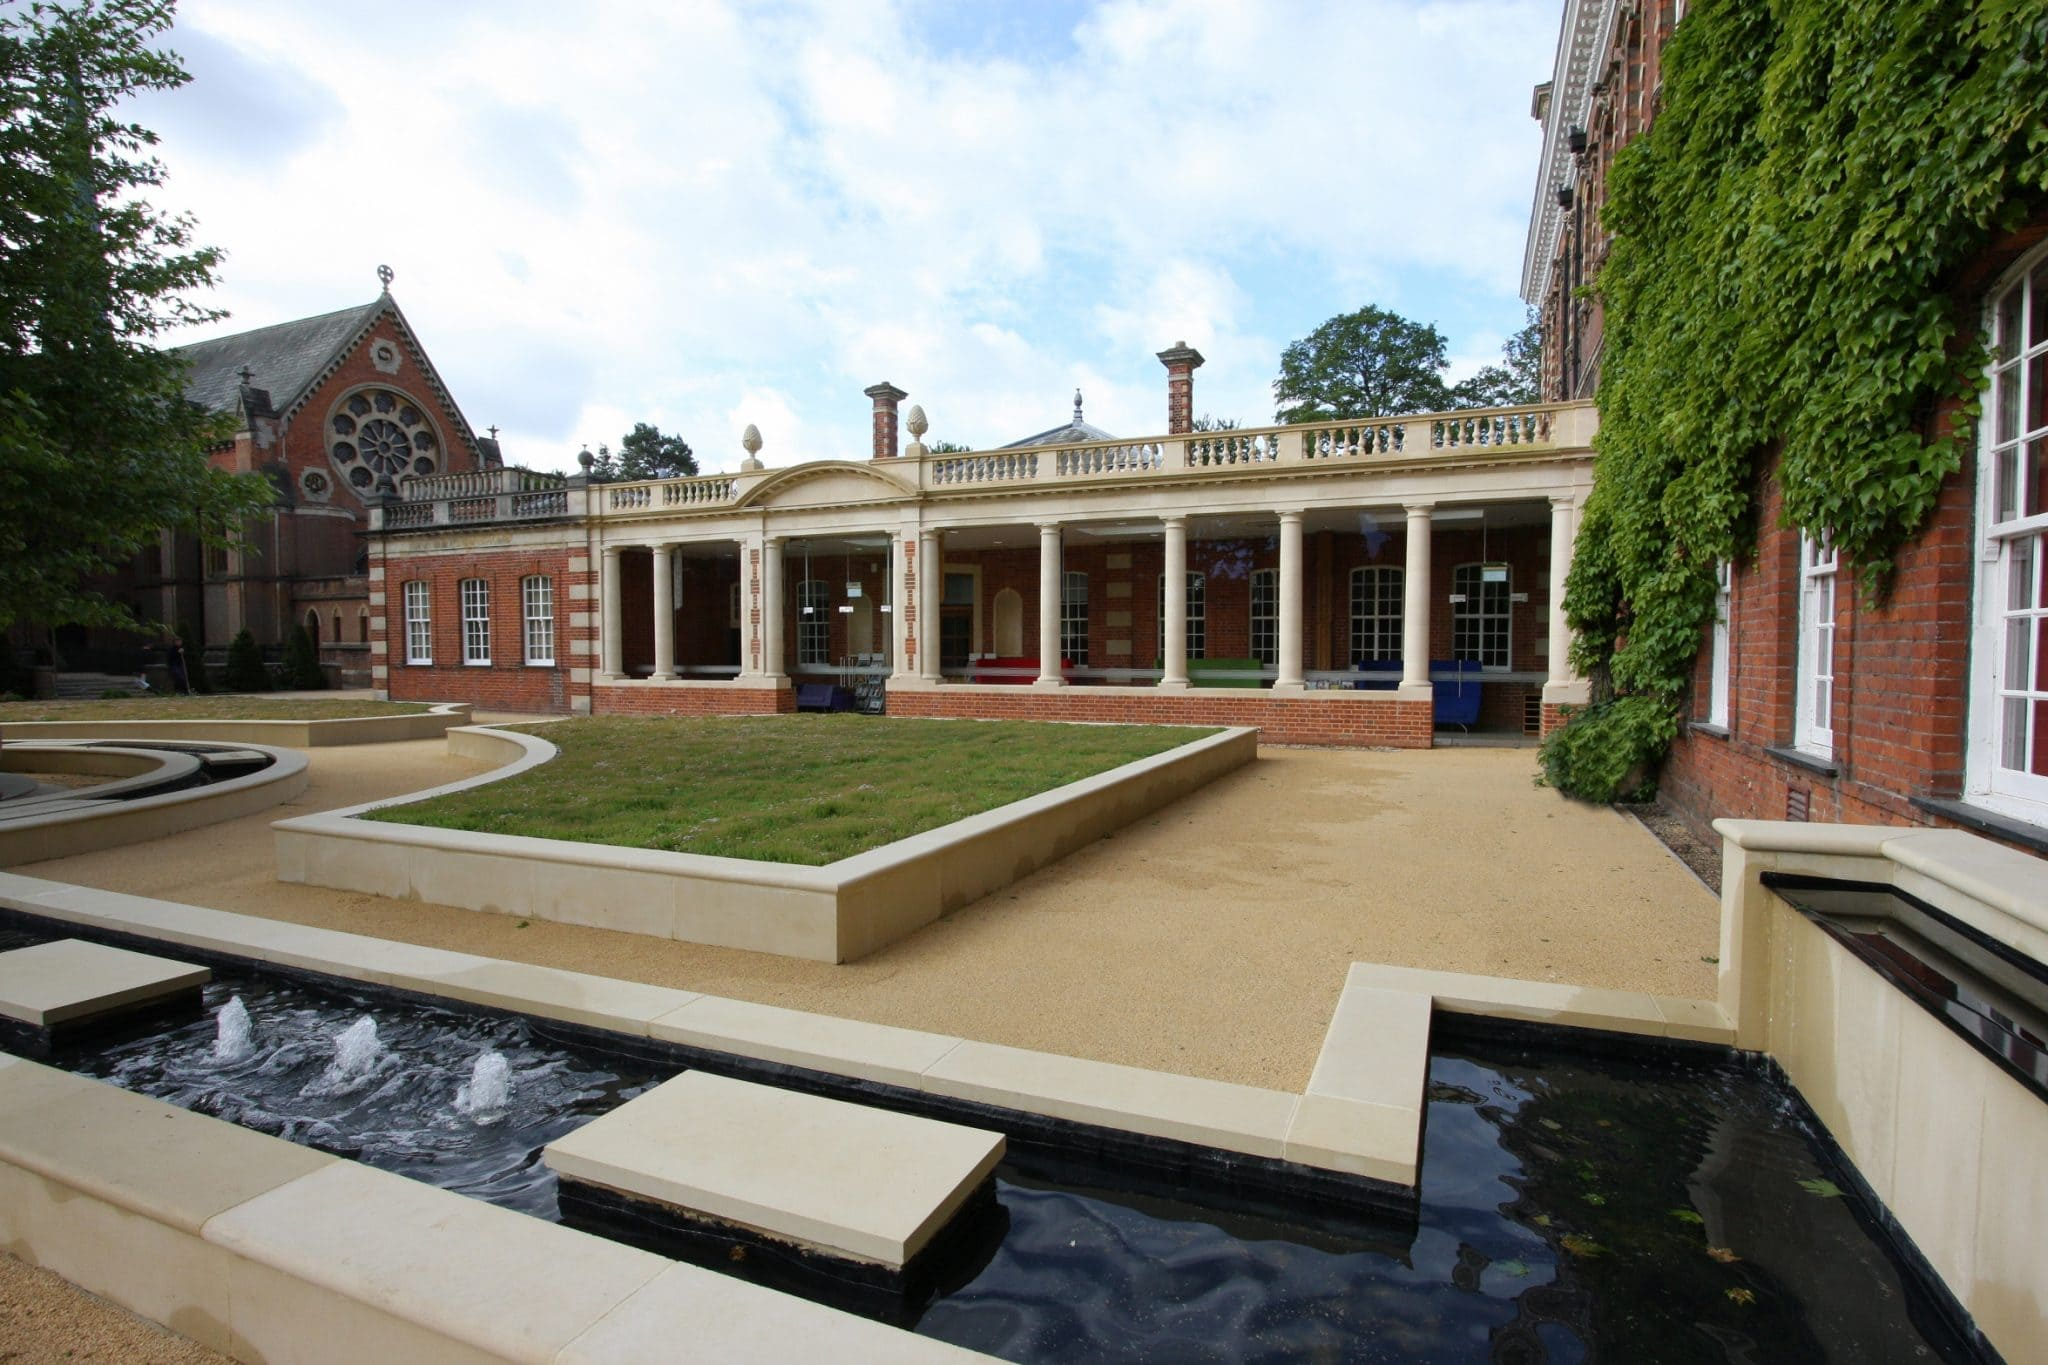 Wellington College Courtyard